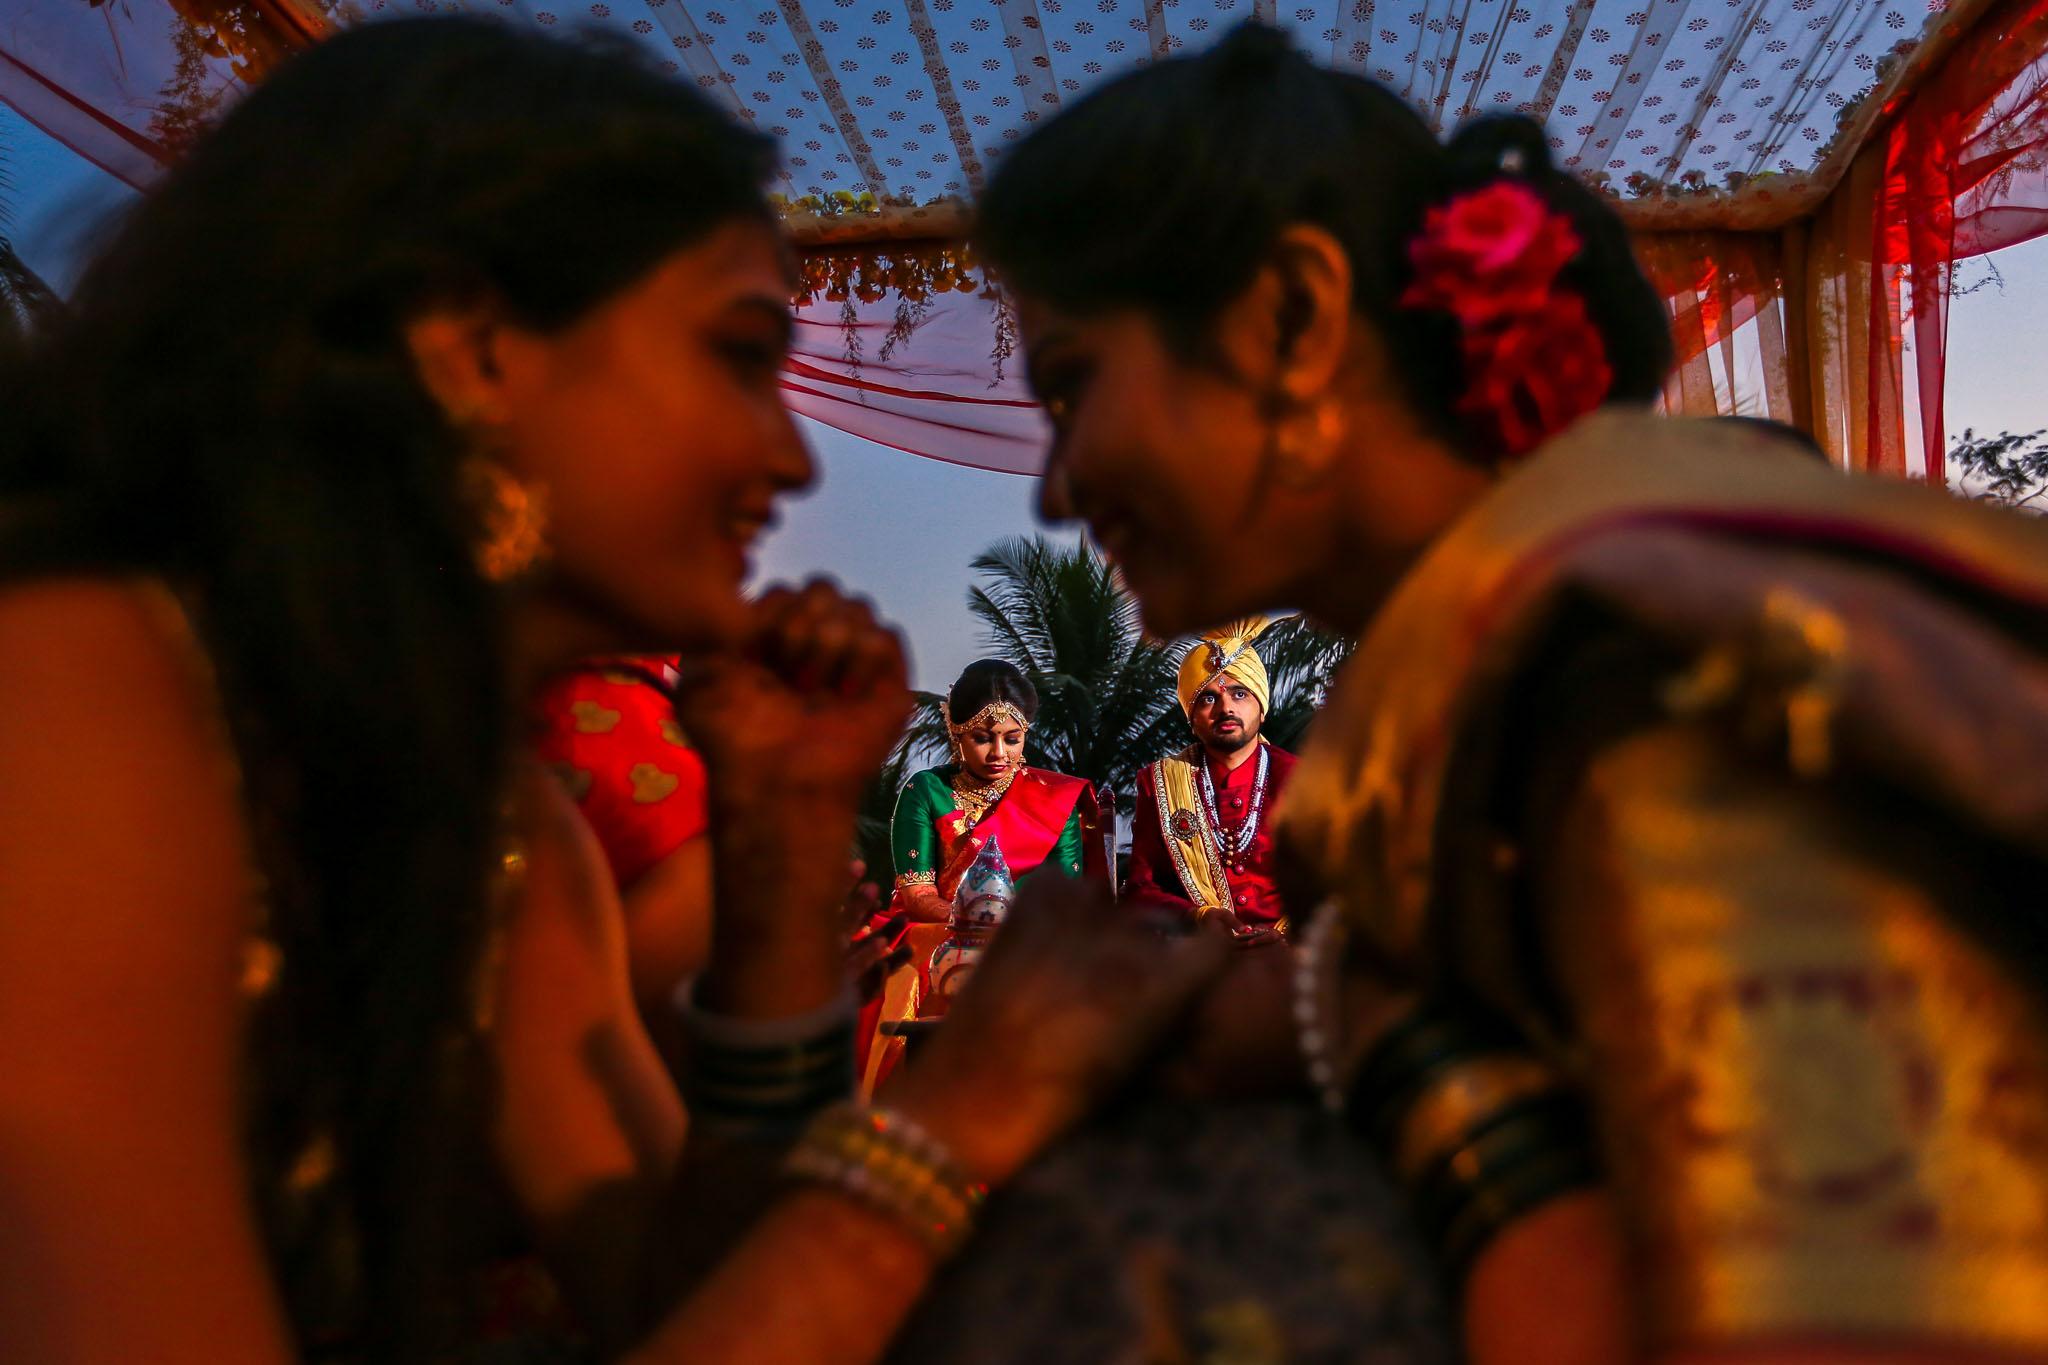 Mukti x Ojas Wedding Akshjay Sansare Photography Best wedding photographer in mumbai India Candid Cinematic Films videos-46.jpg